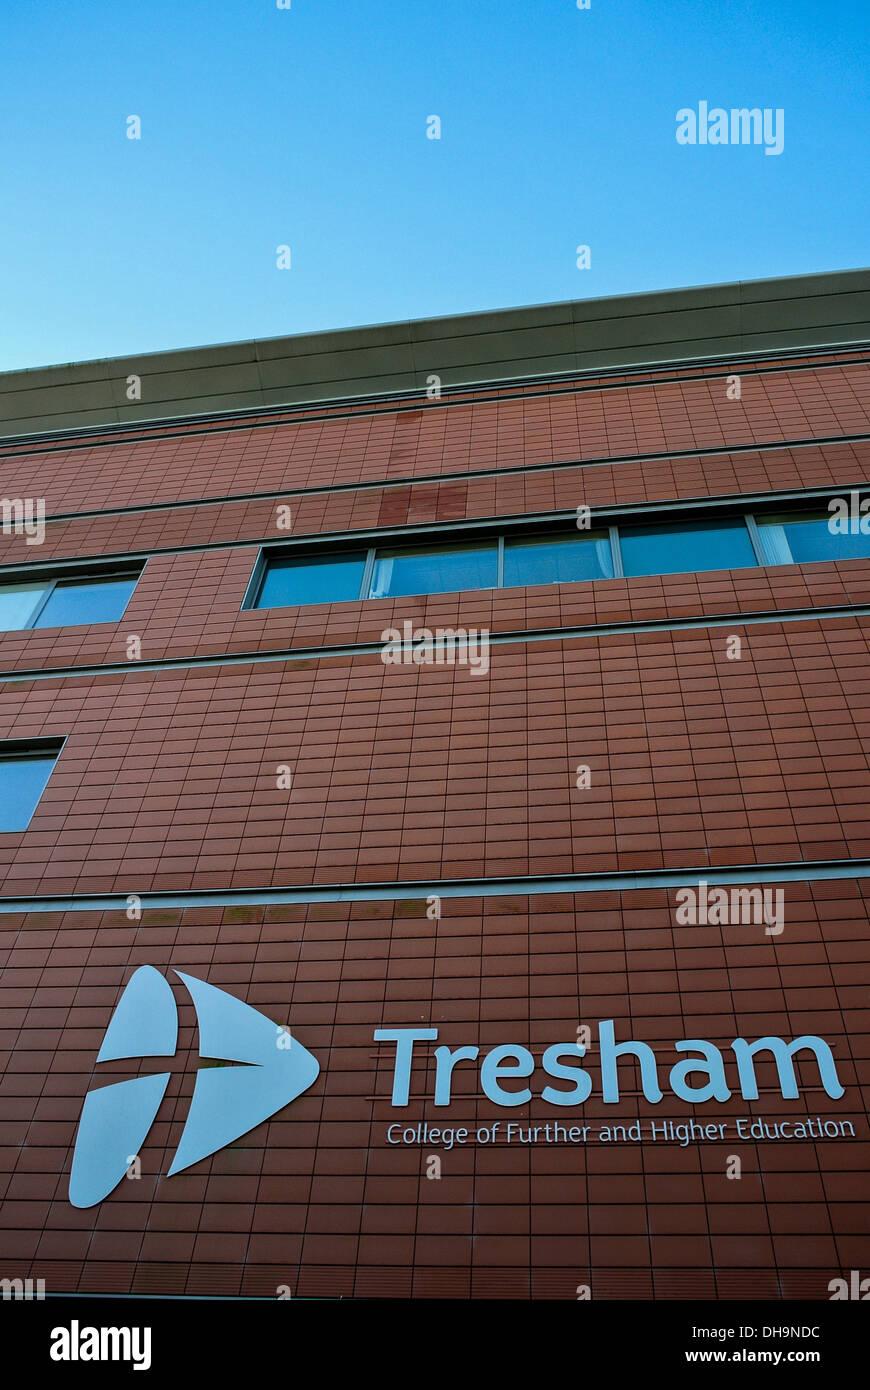 Tresham College Kettering Northamptonshire - Stock Image